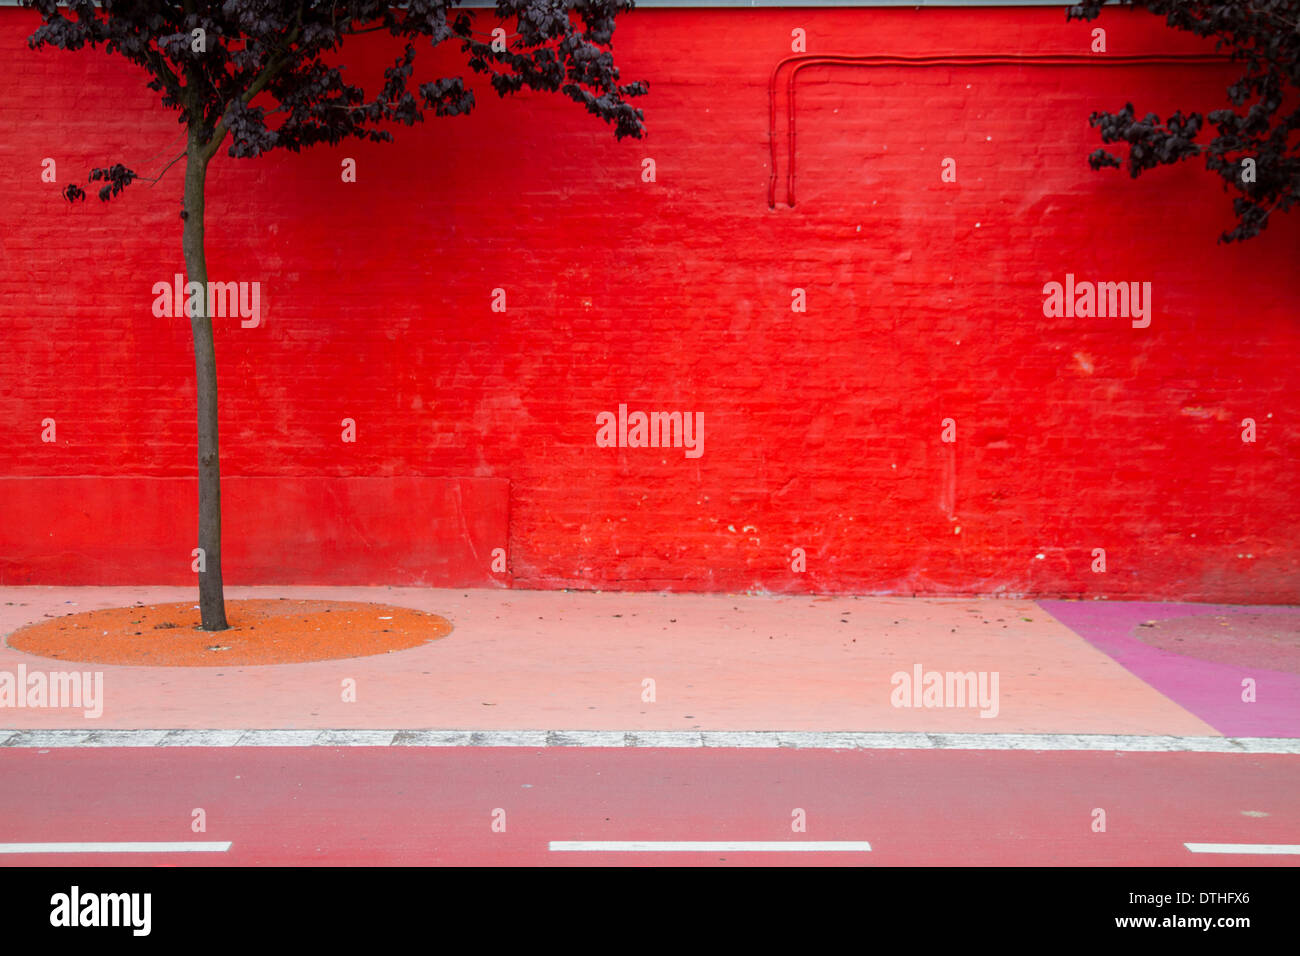 Red wall in Superkilen a public park in the Nørrebro district of Copenhagen, Denmark. - Stock Image